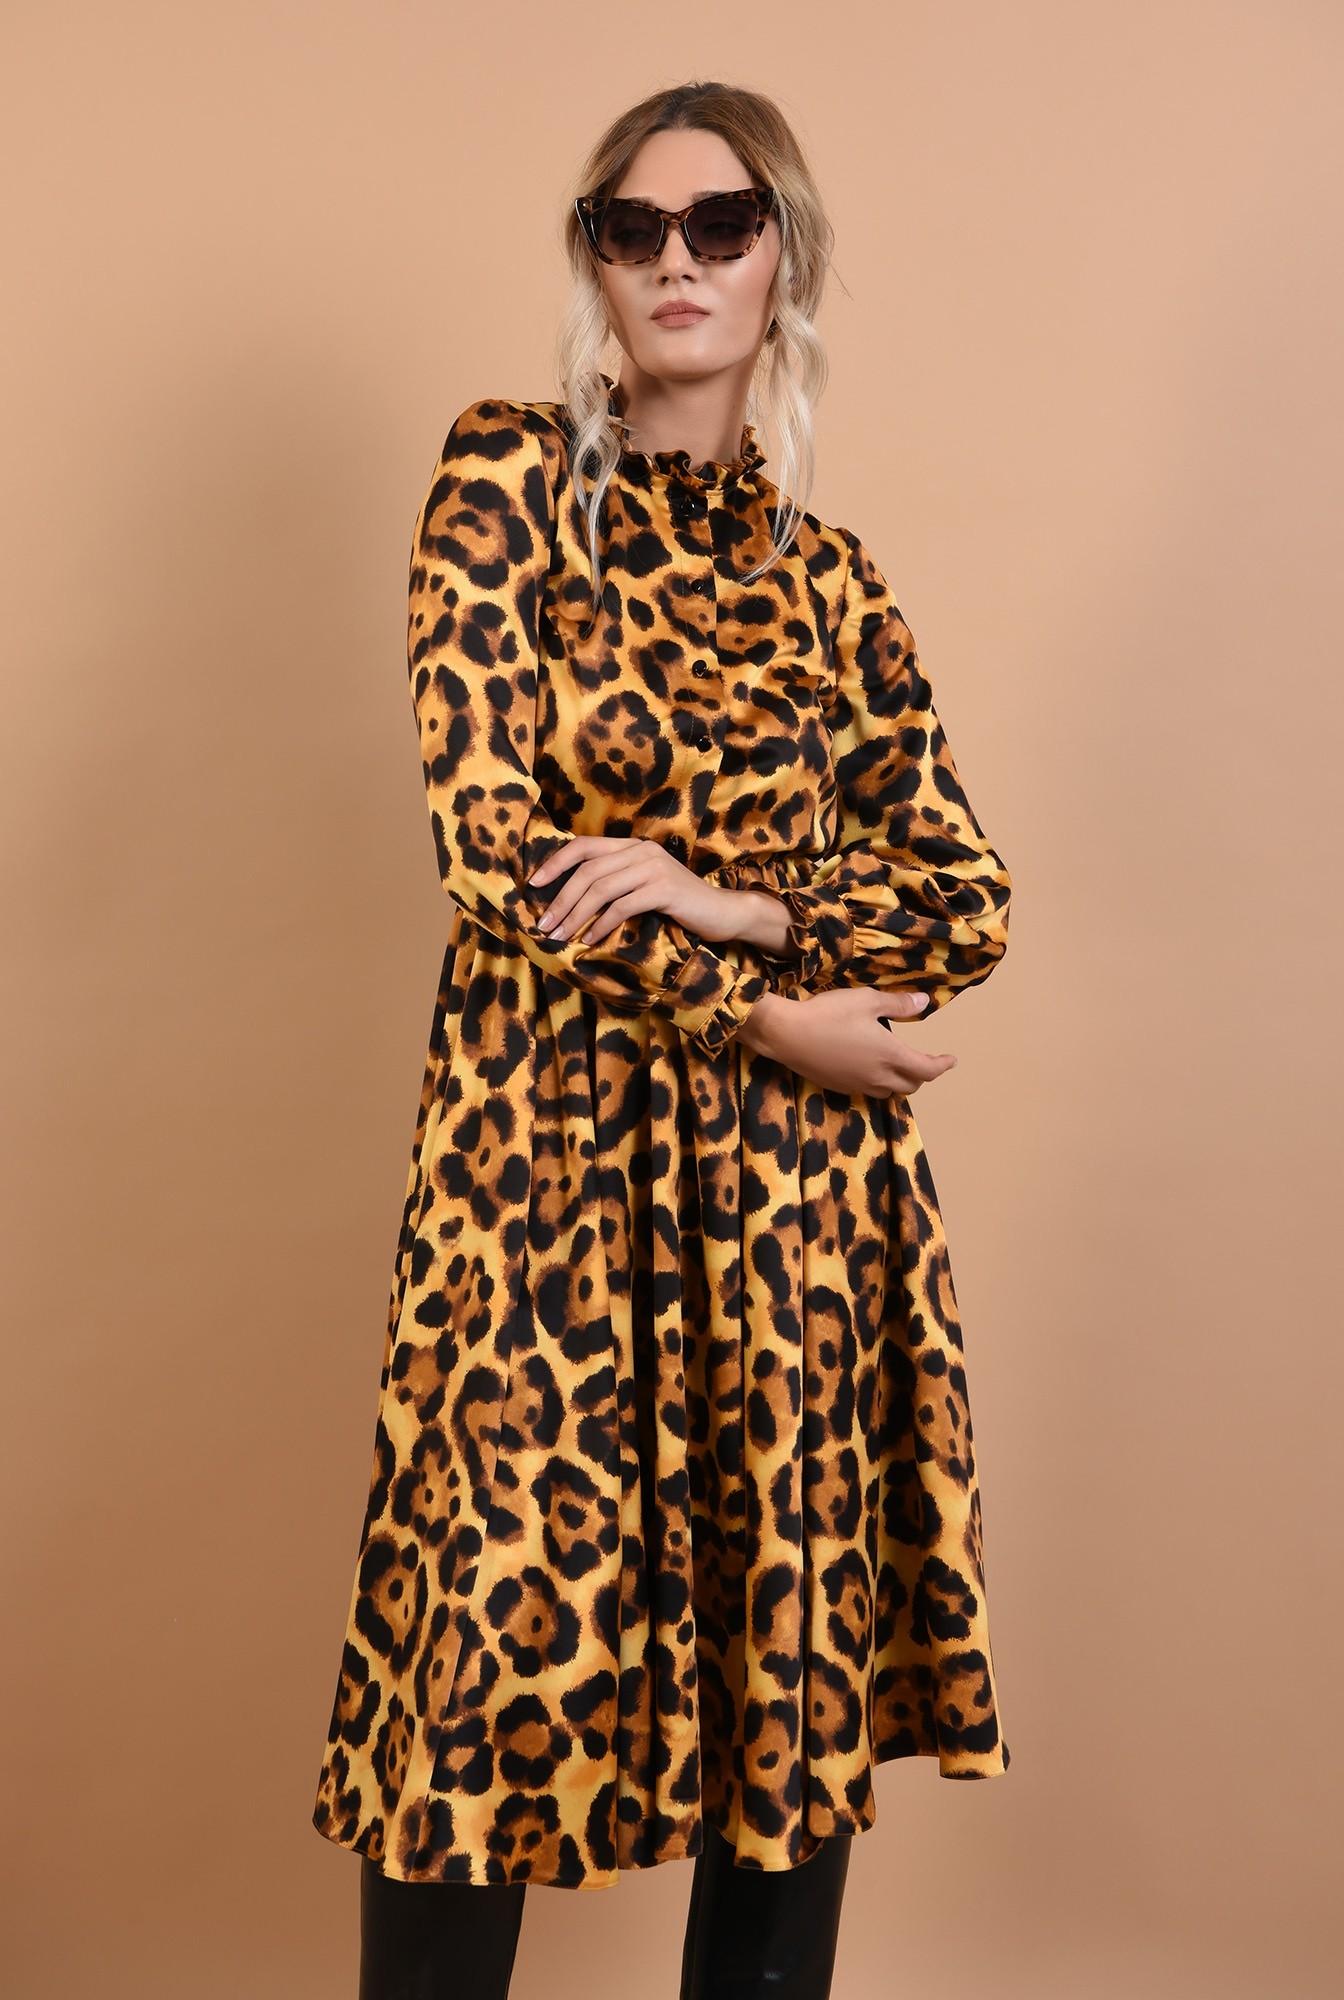 0 - rochie eleganta, din satin animal print, cu nasturi, cu guler, Poema